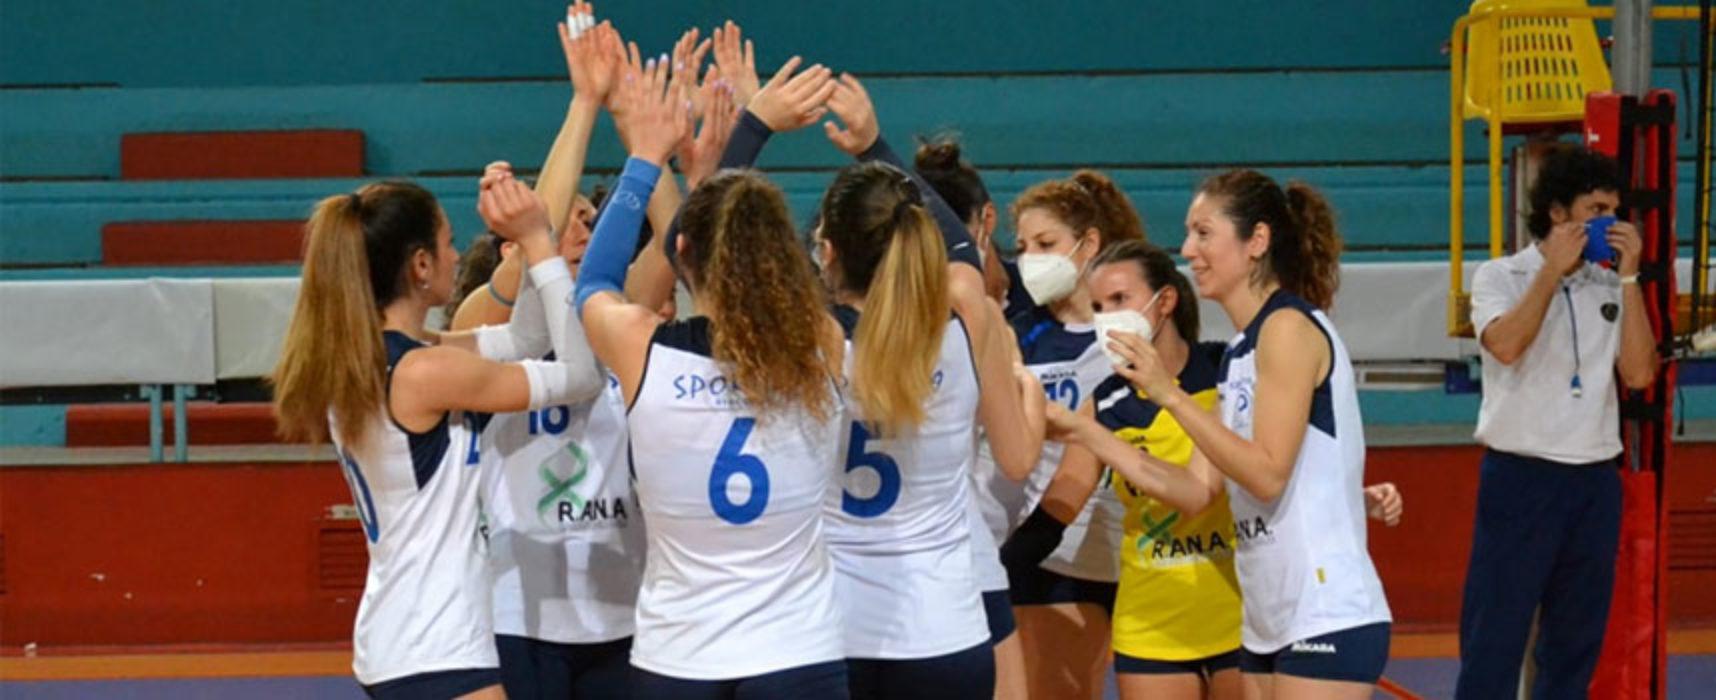 Sportilia Bisceglie batte Polis Volley e torna in vetta